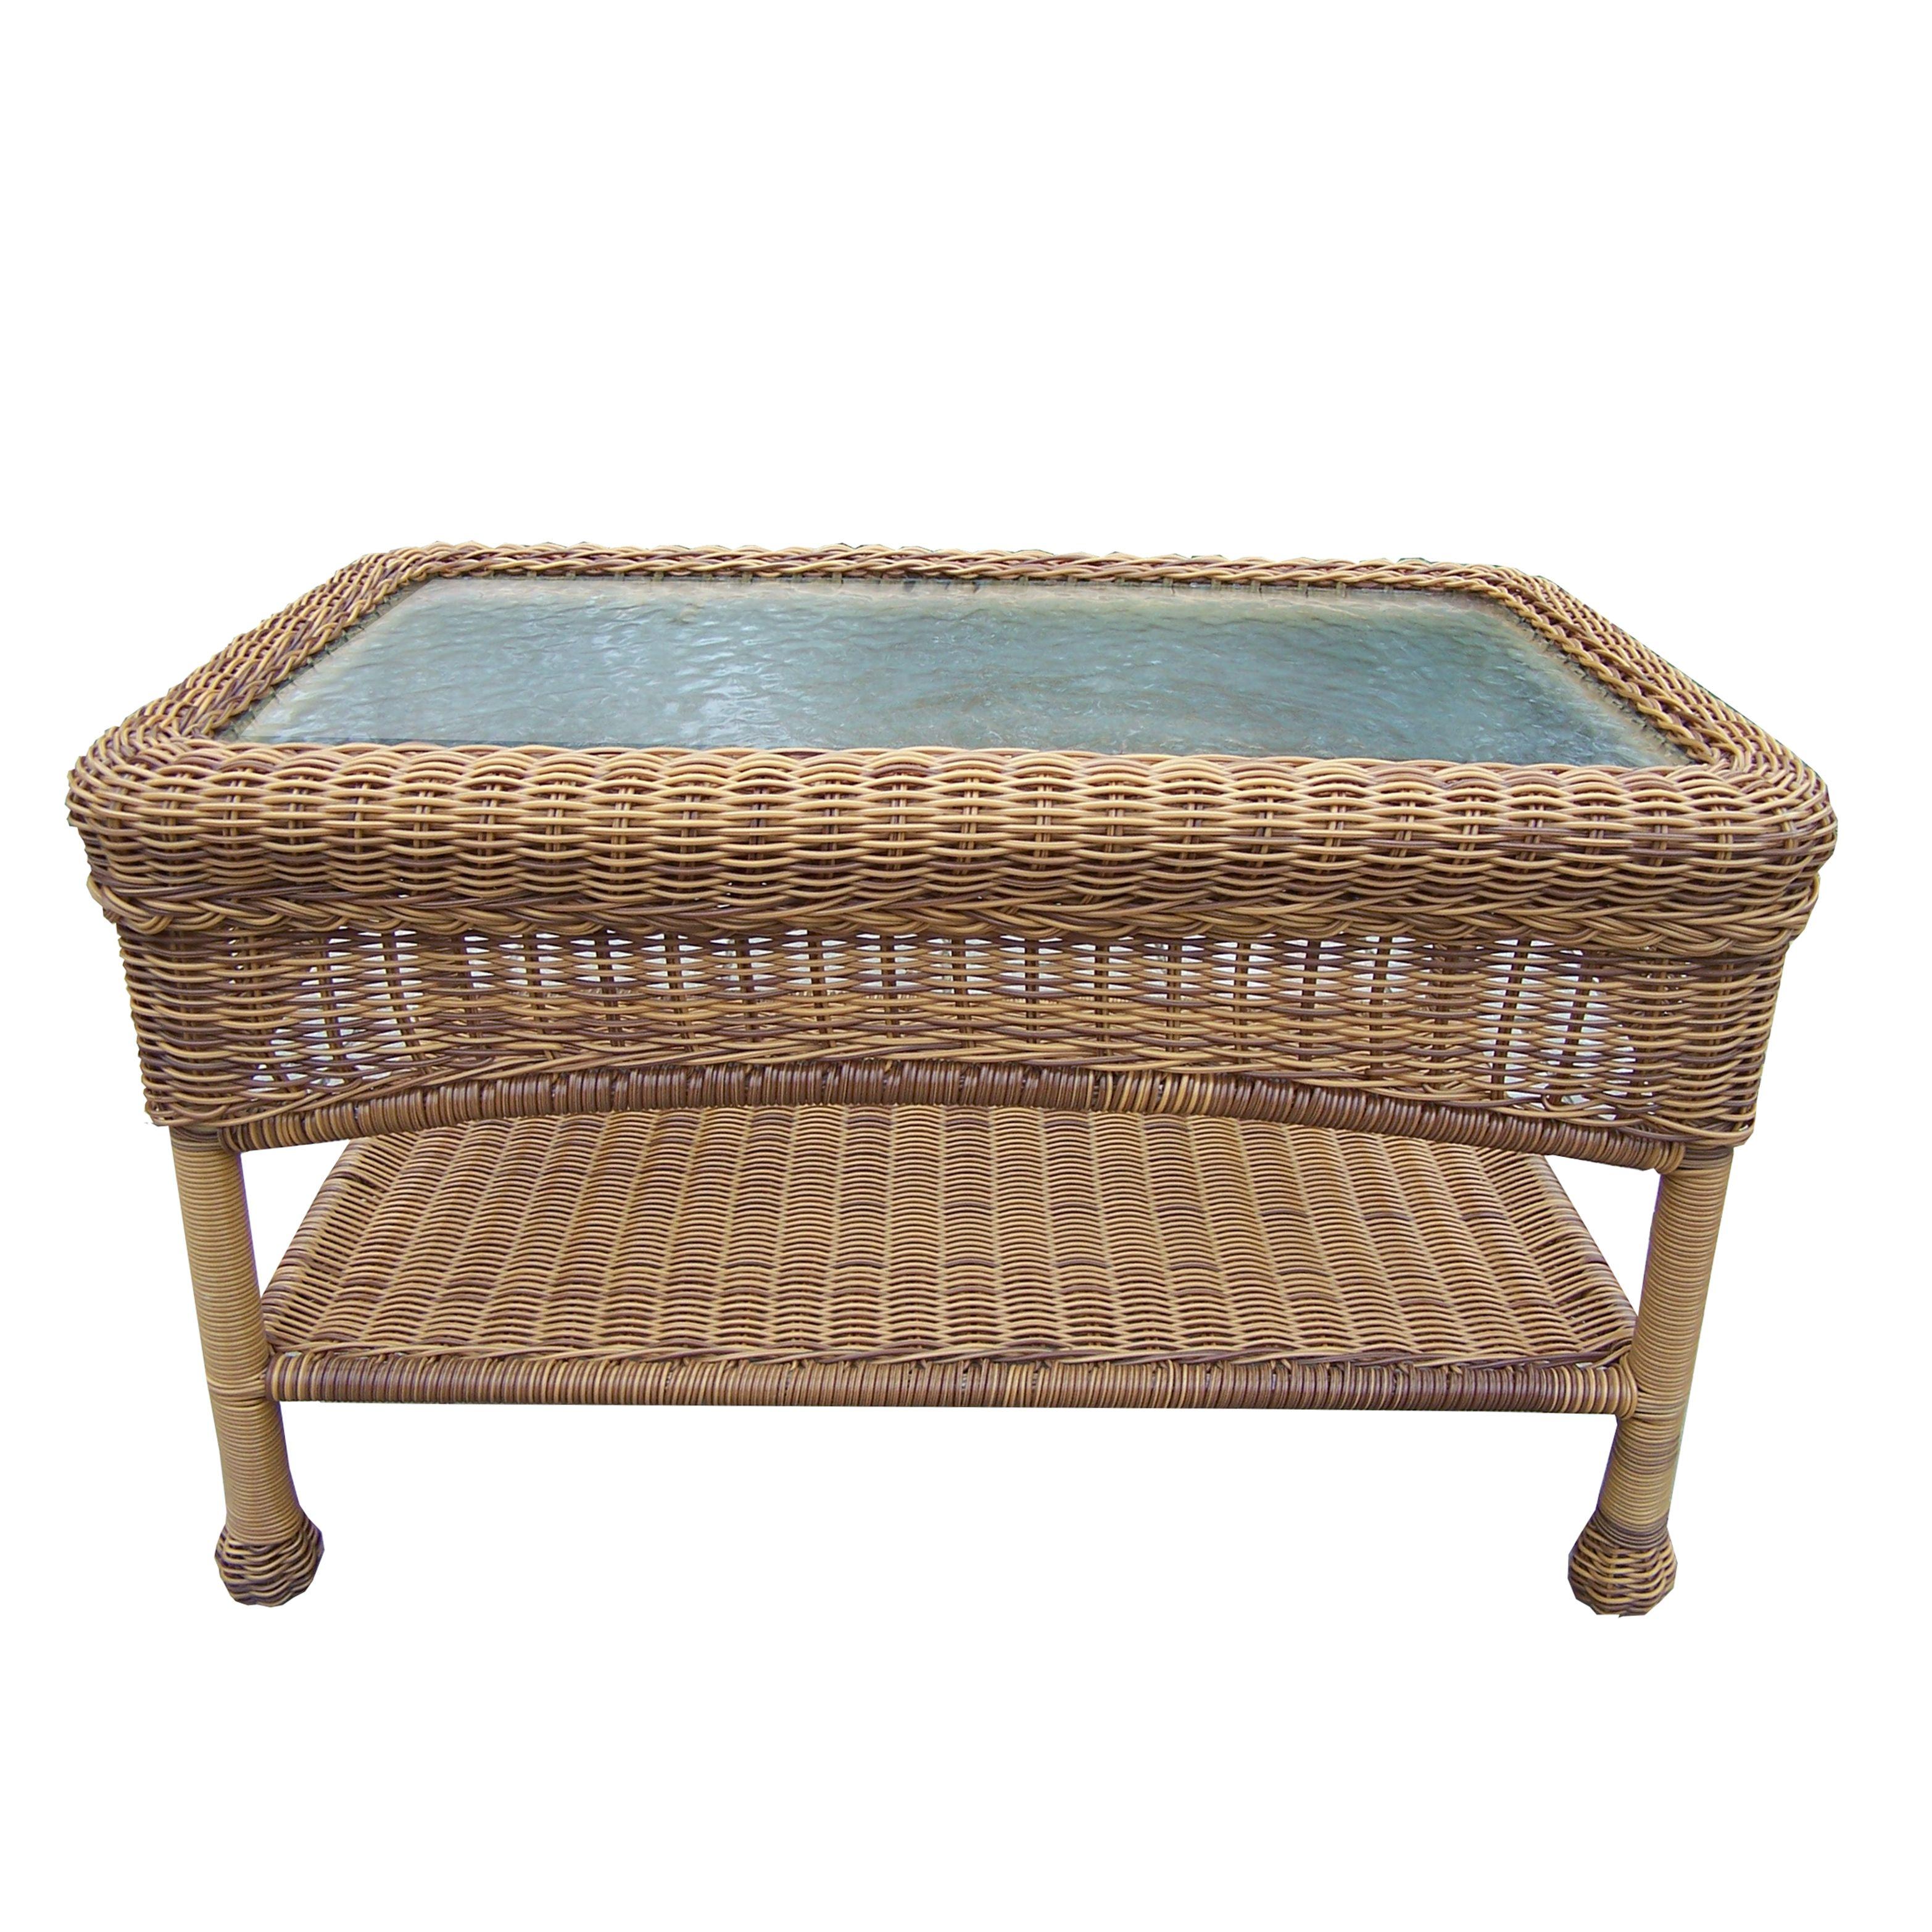 White Wicker Coffee Table Lanai Wicker Paradise Wicker Coffee Table Coffee Table Wicker Table